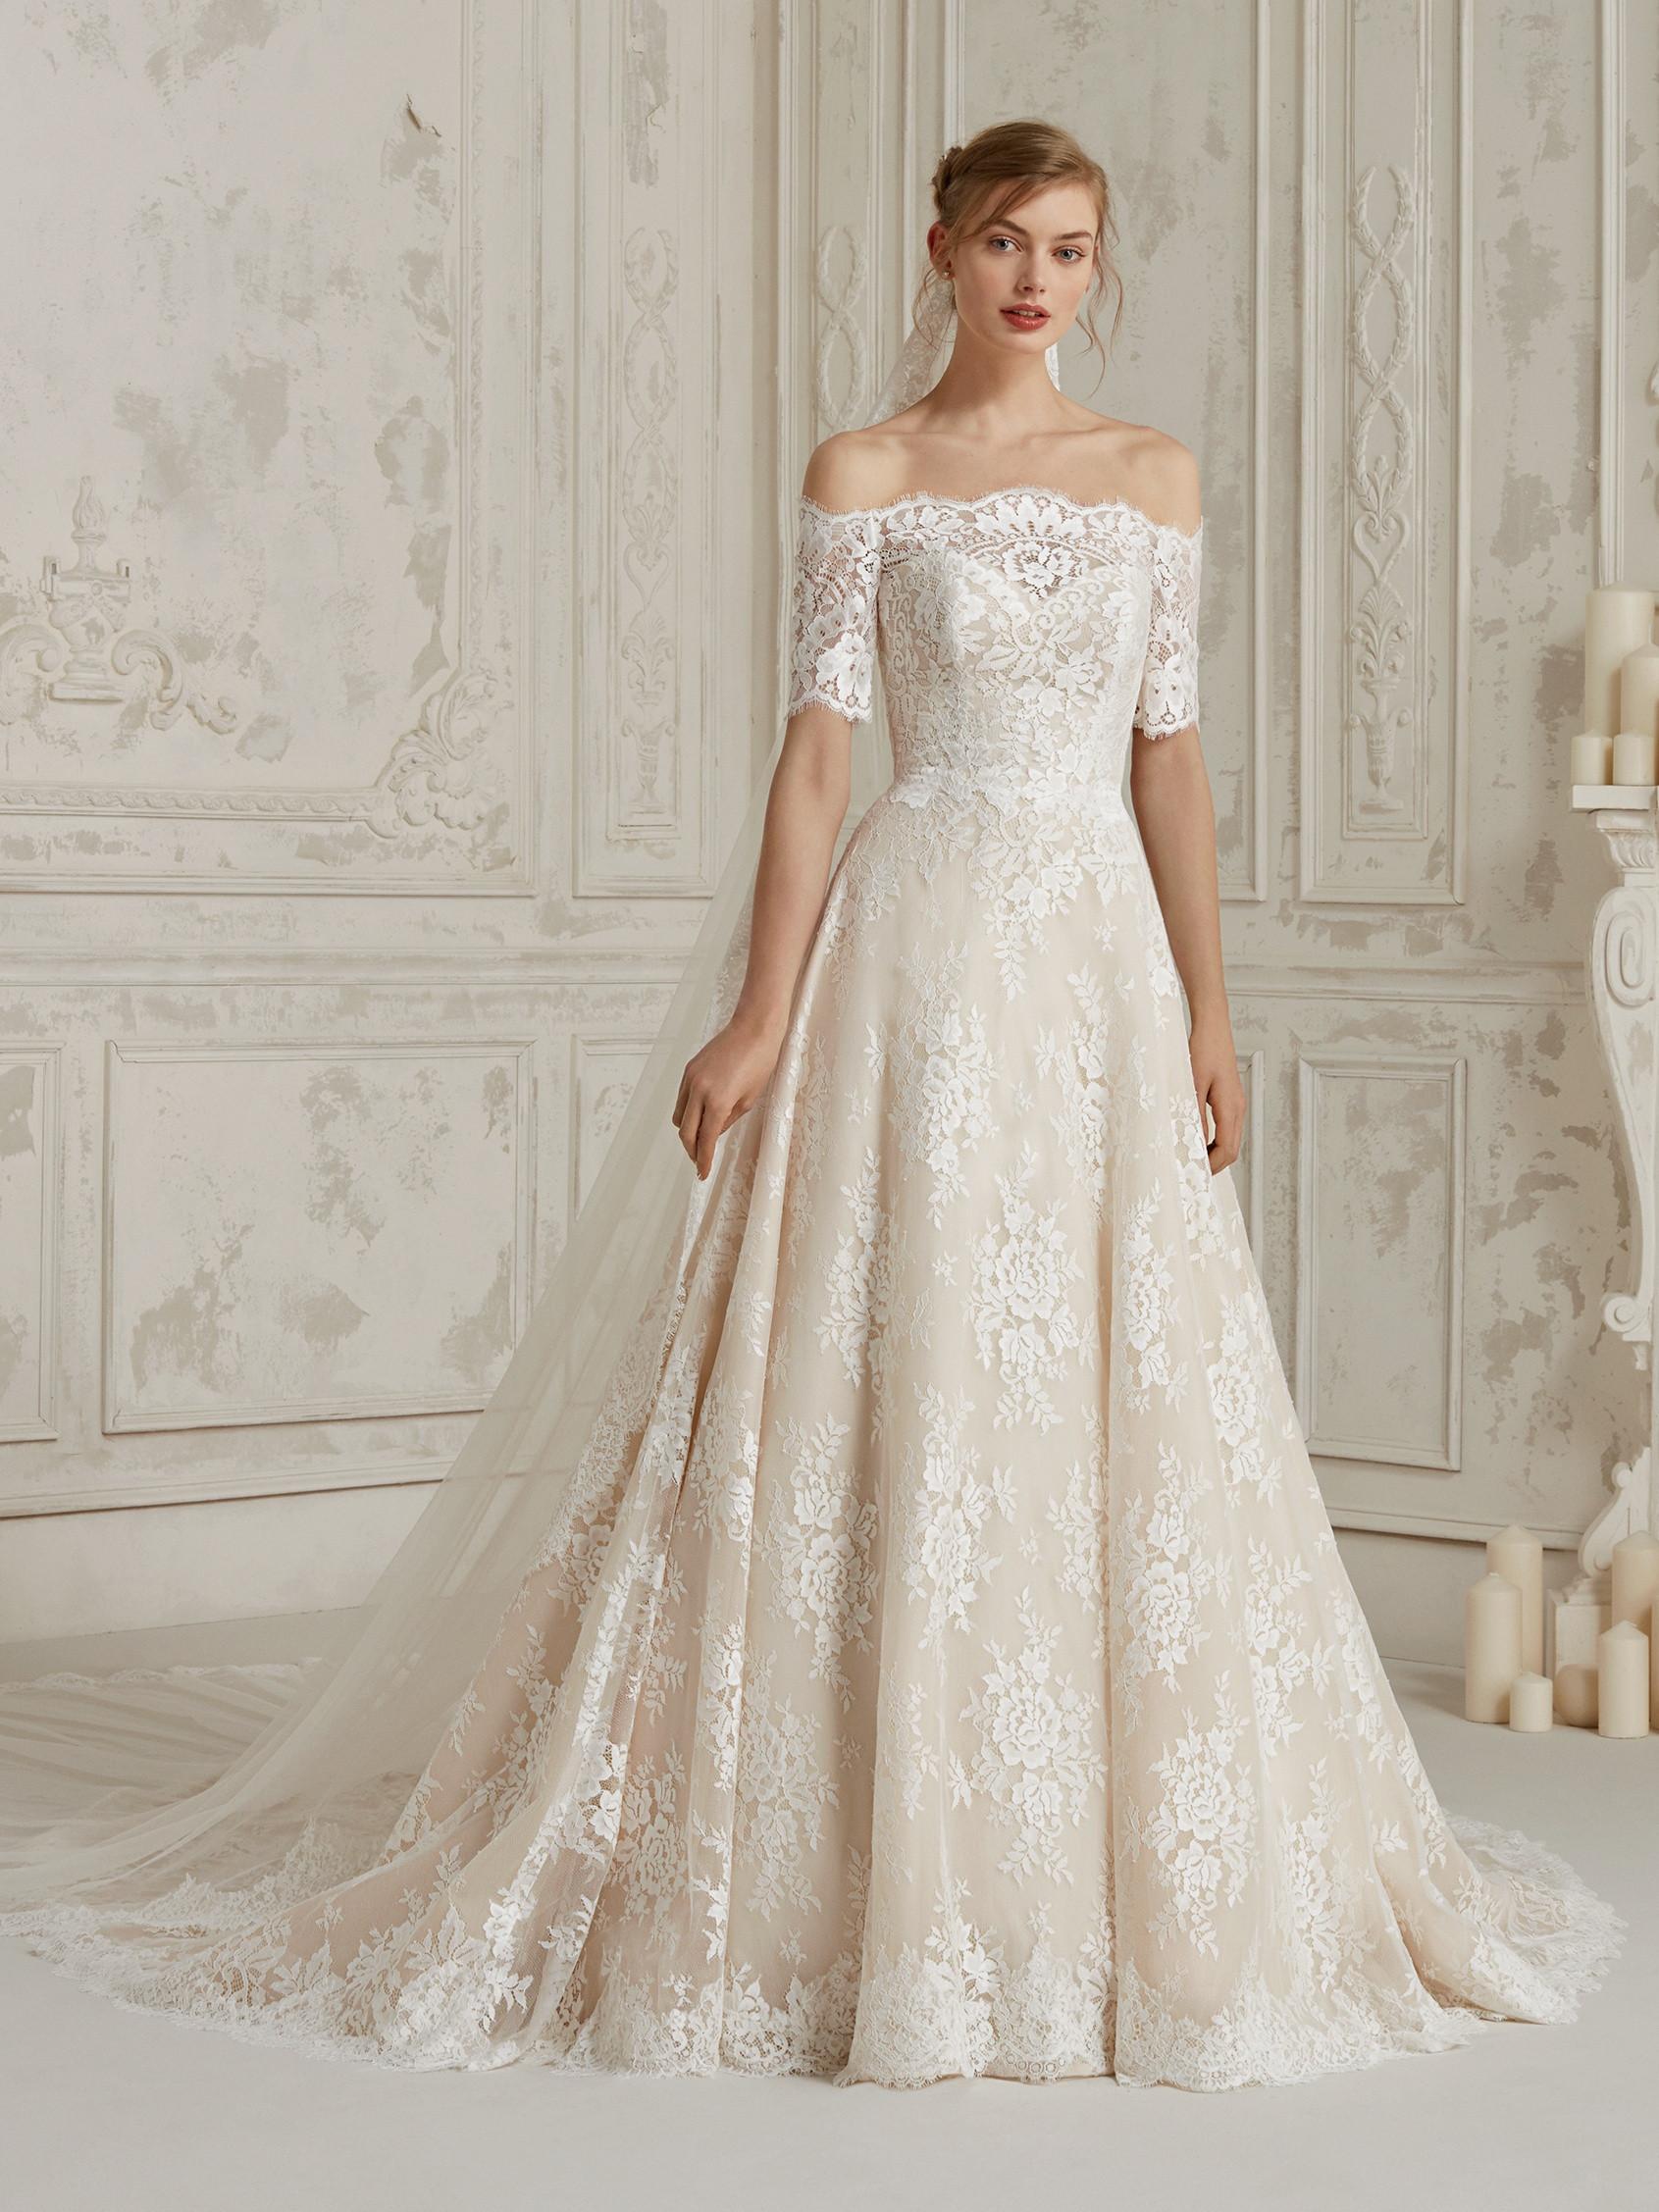 Off The Shoulder Fully Lace A Line Wedding Dress Kleinfeld Bridal